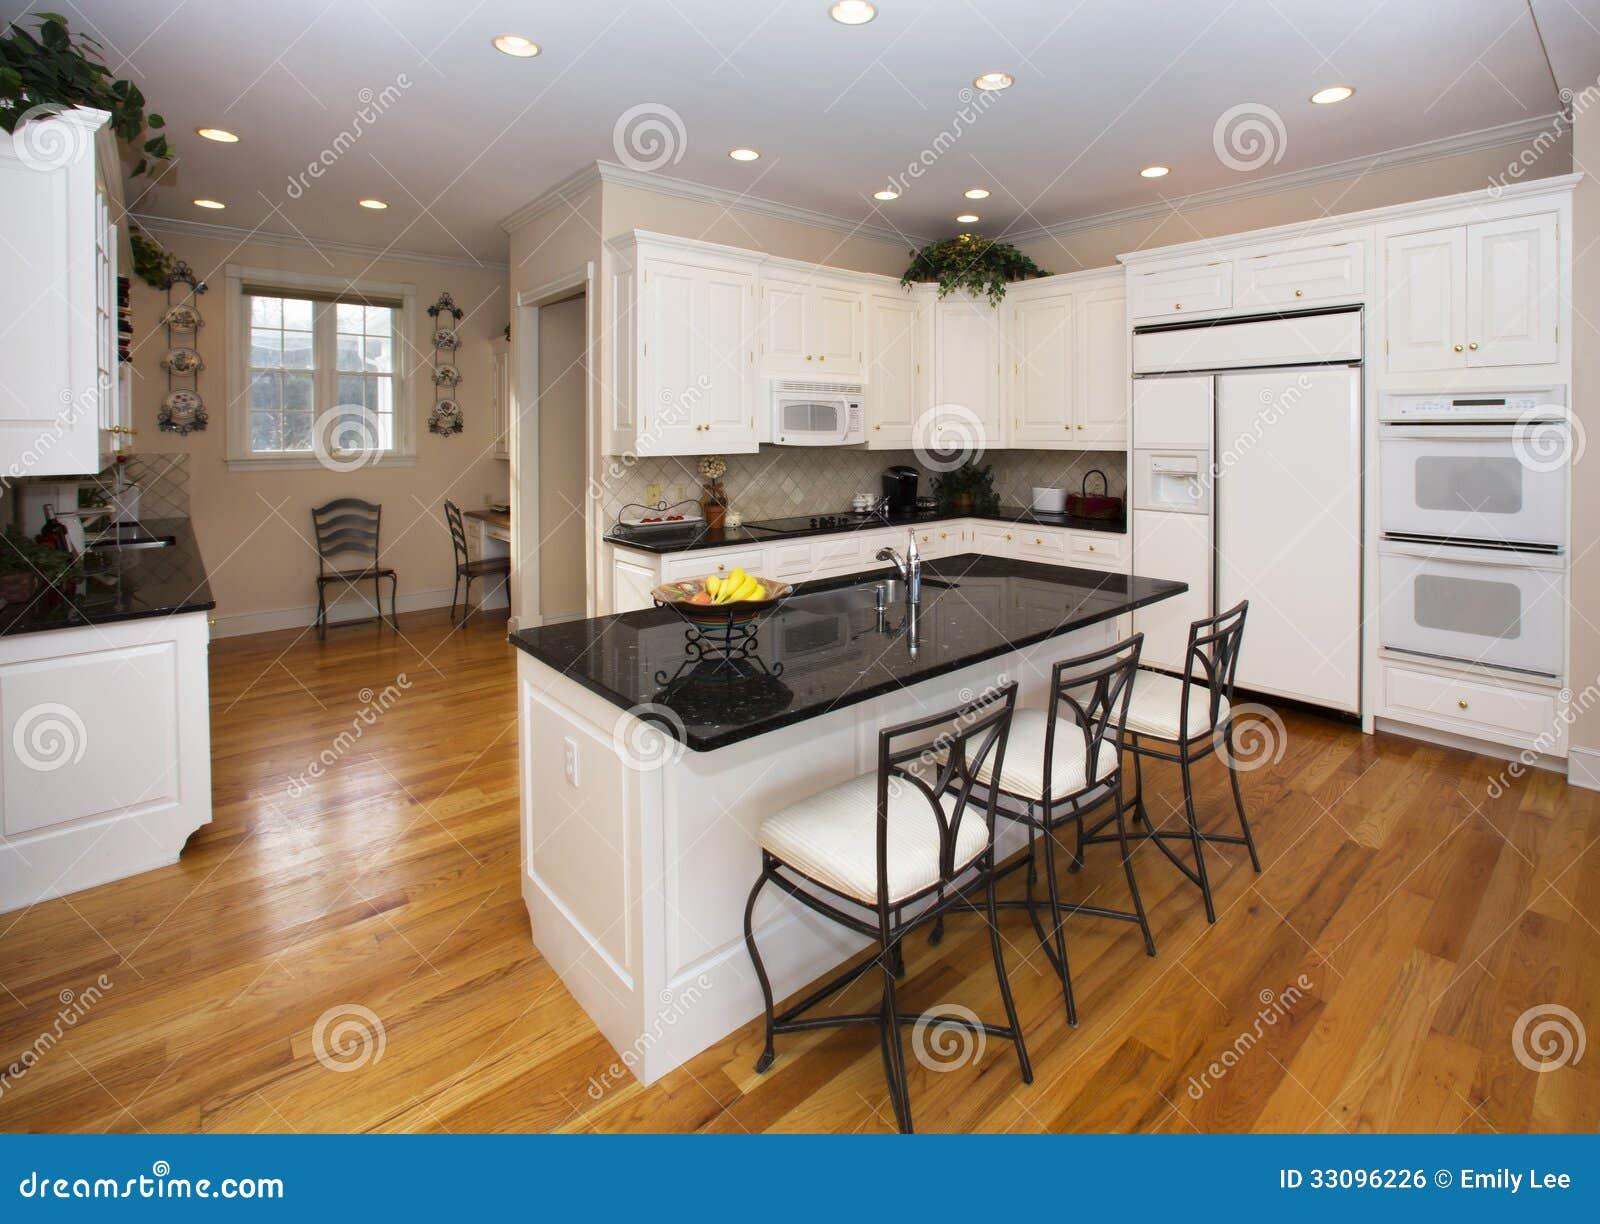 Witte Keuken Houten Vloer : heldere moderne die keuken in wit met zwarte accenten, houten vloer